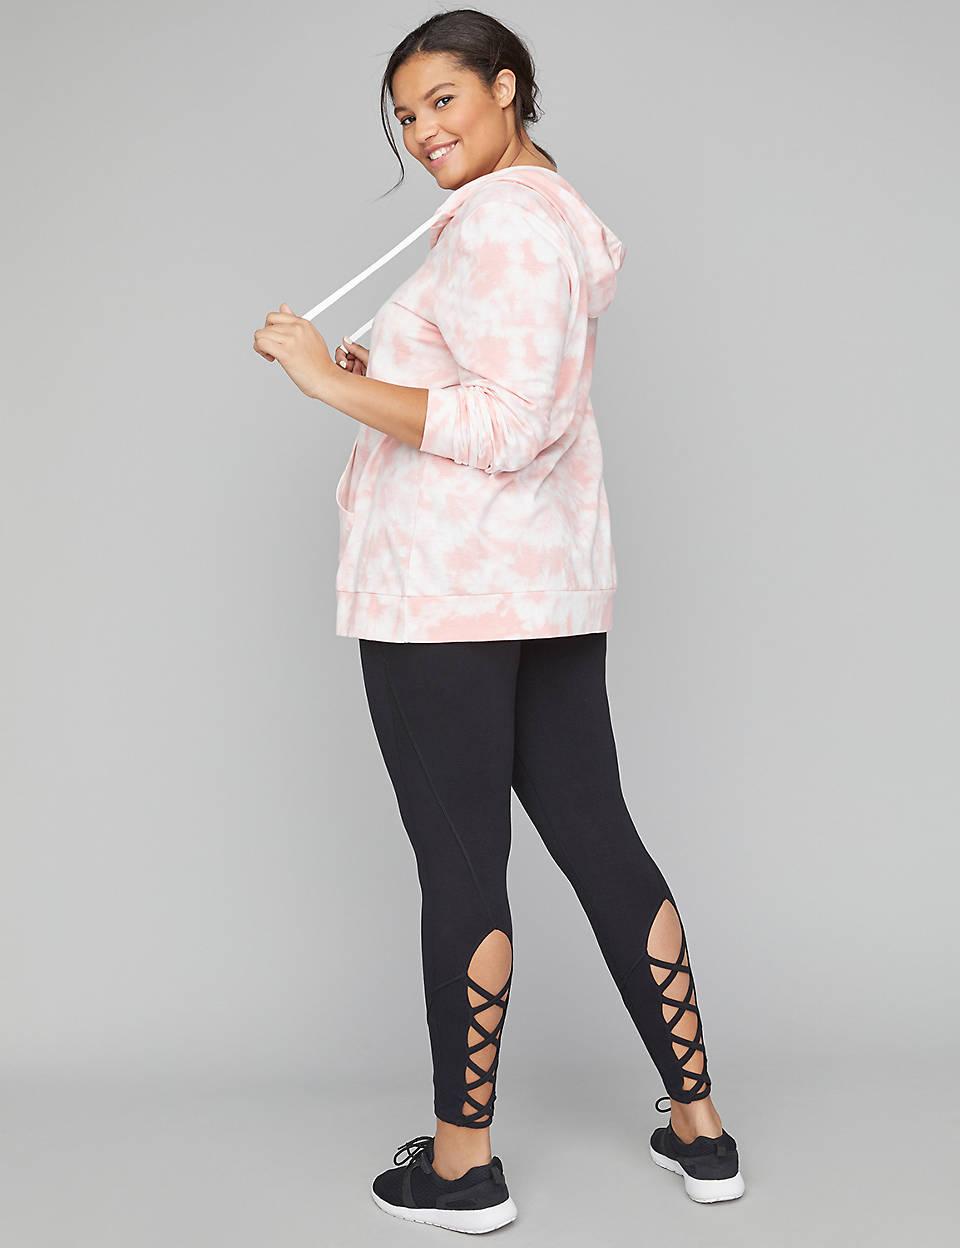 d2332691443 Signature Stretch Active 7 8 Legging - Lace-Up Hem